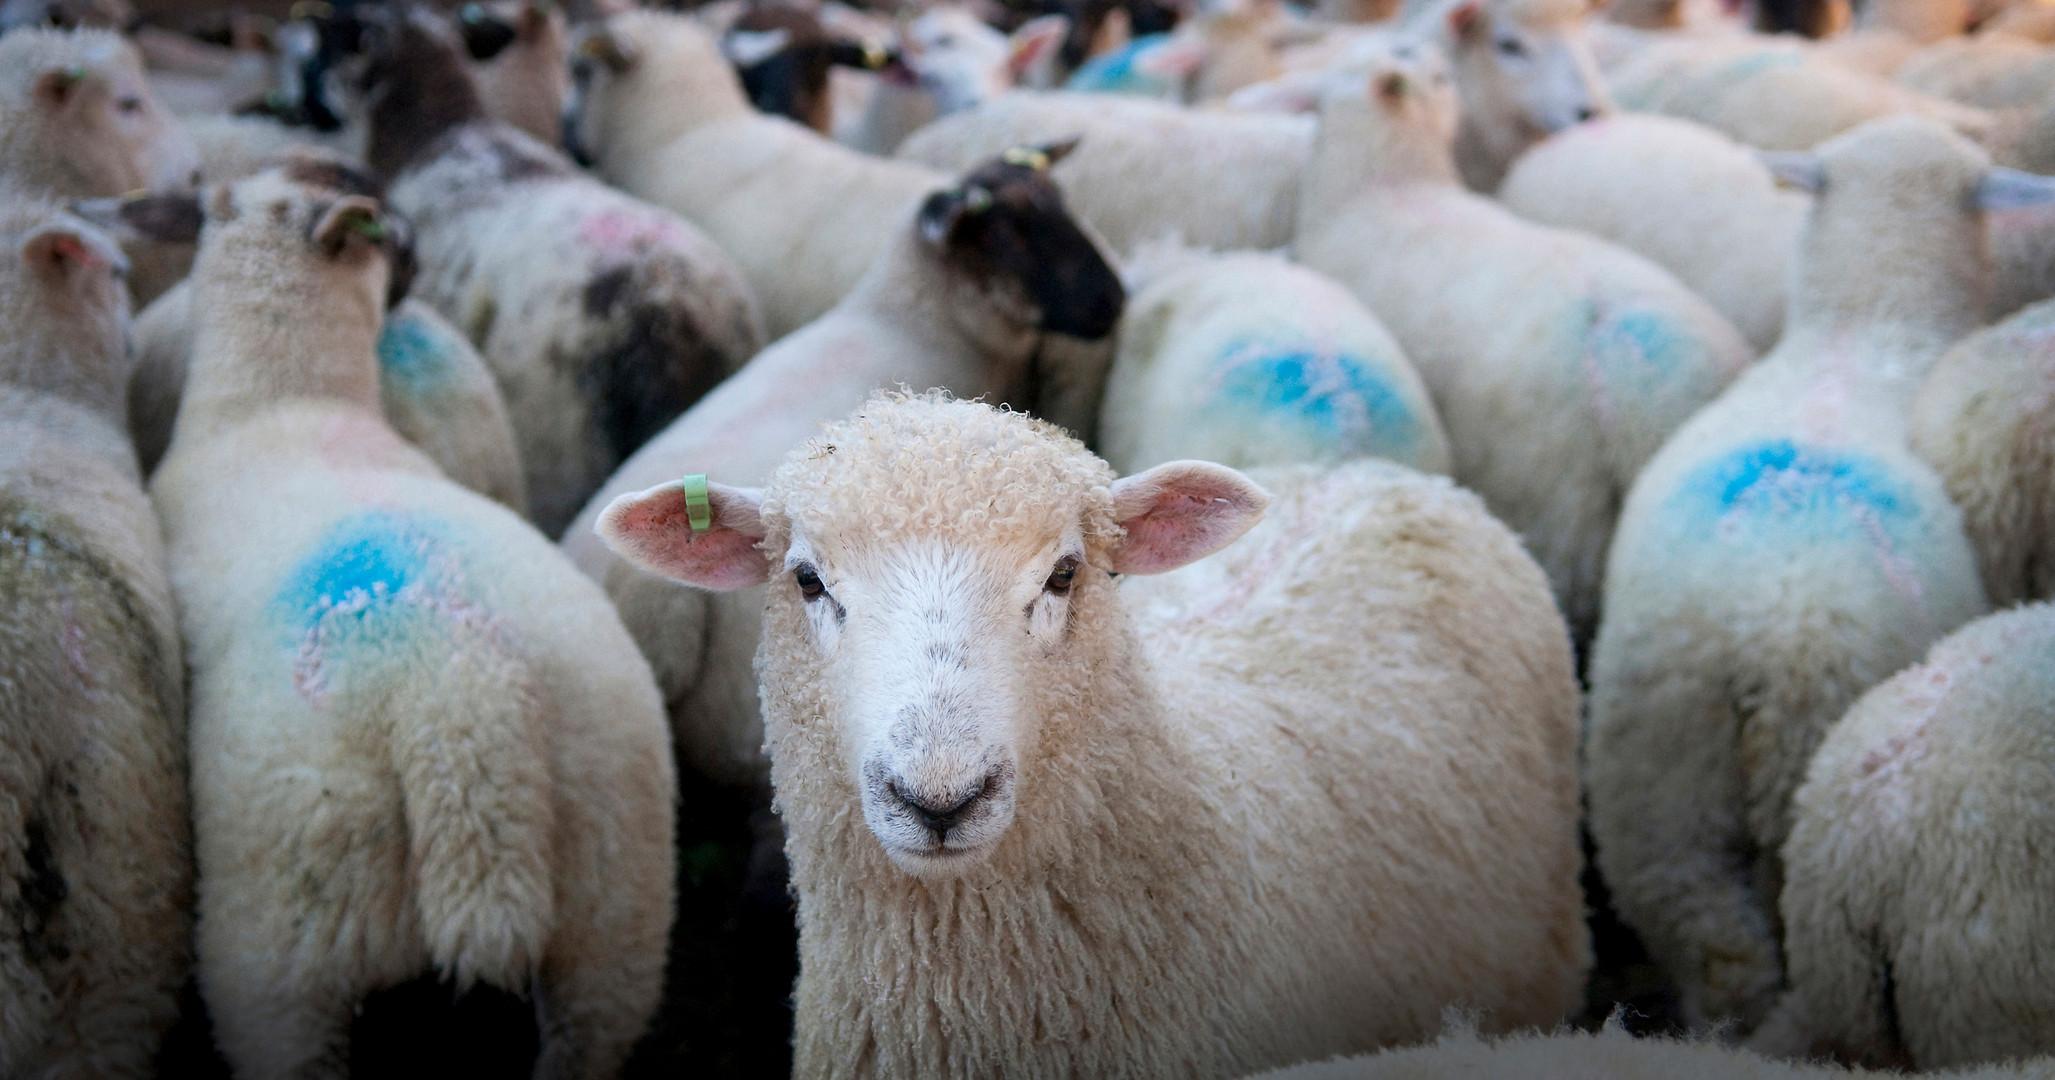 Sheep for Corporate Report by Sirastudio. Photographers in Harrogate.